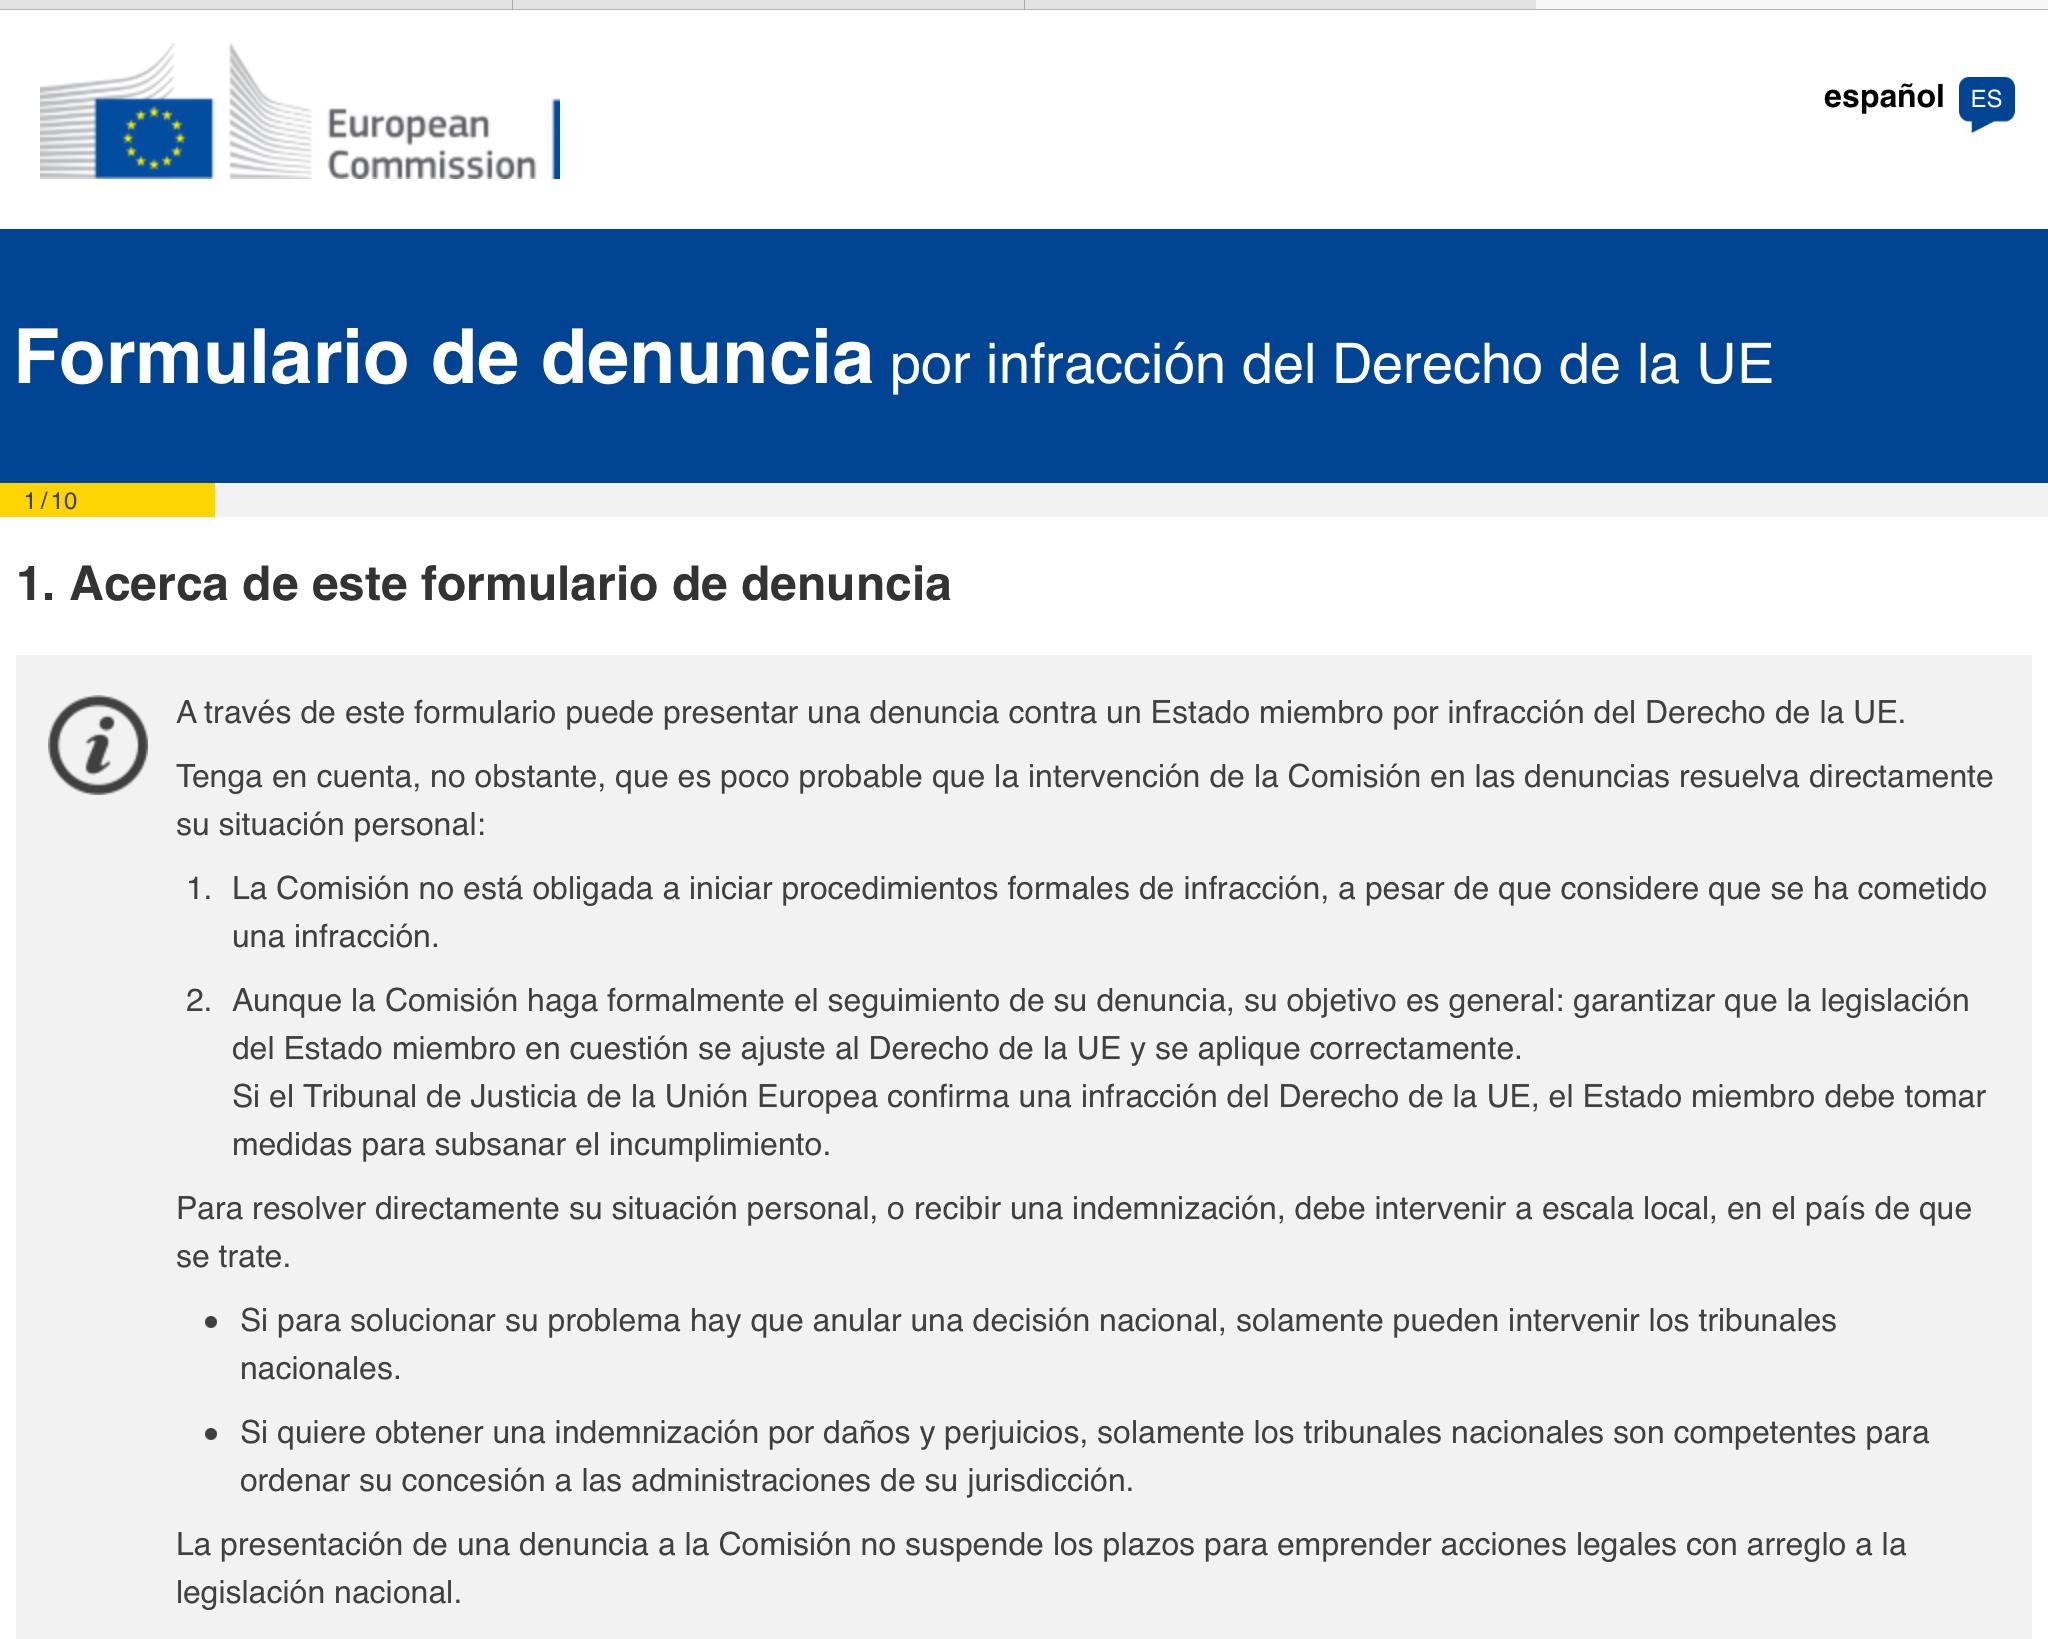 MODELO DENUNCIA ANTE COMISIÓN EUROPEA CONTRA DISCRIMINACIÓN EXTRACOMUNITARIOS QUE ALQUILAN INMUEBLES EN ESPAÑA (en Impuesto Renta No Residentes)